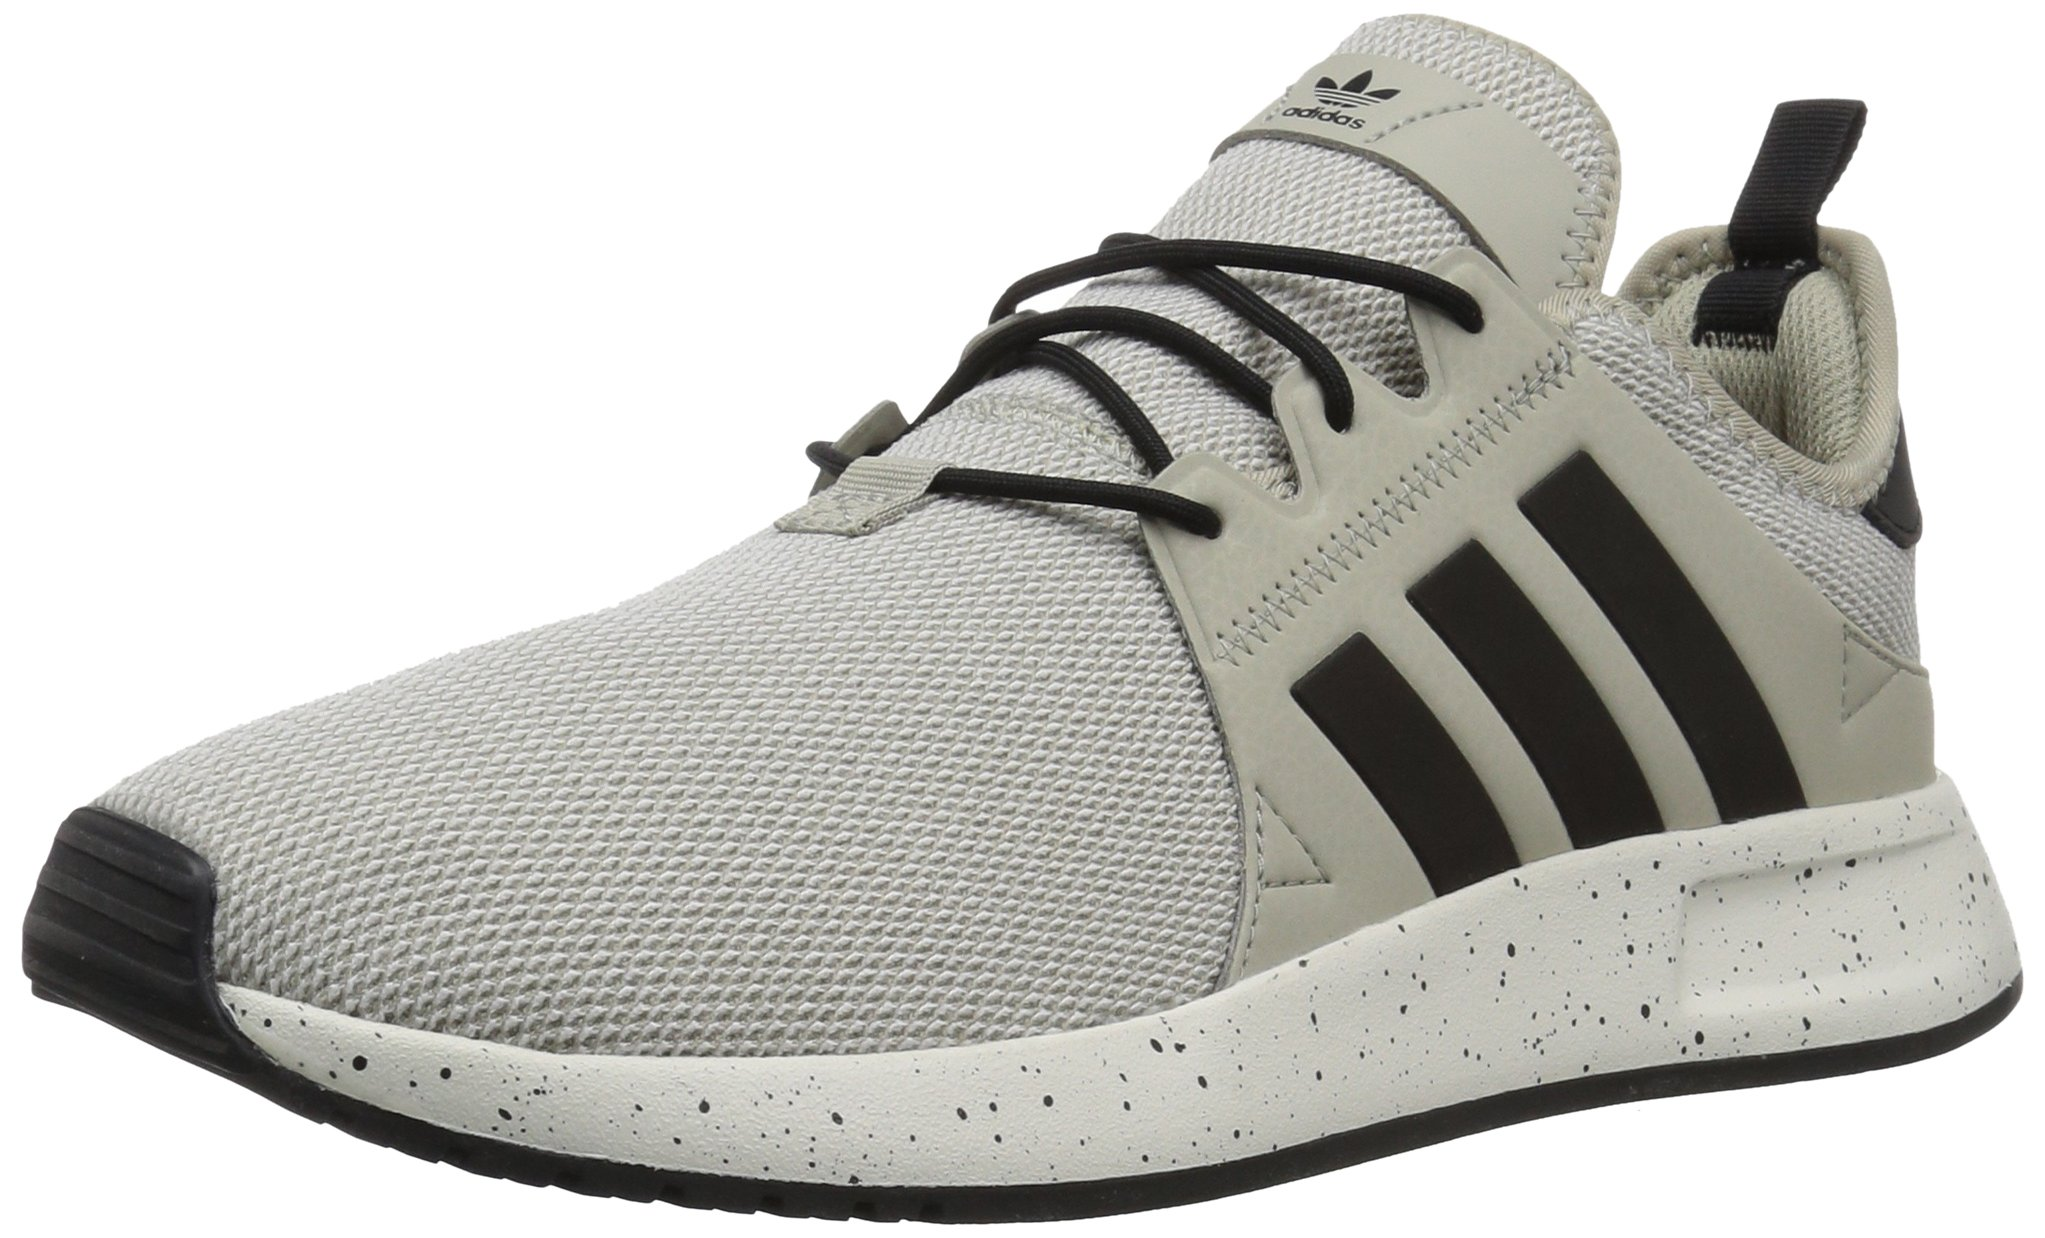 adidas Originals Mens X_PLR Running Shoe Sneaker Black/Sesame, 3.5 M US by adidas Originals (Image #1)